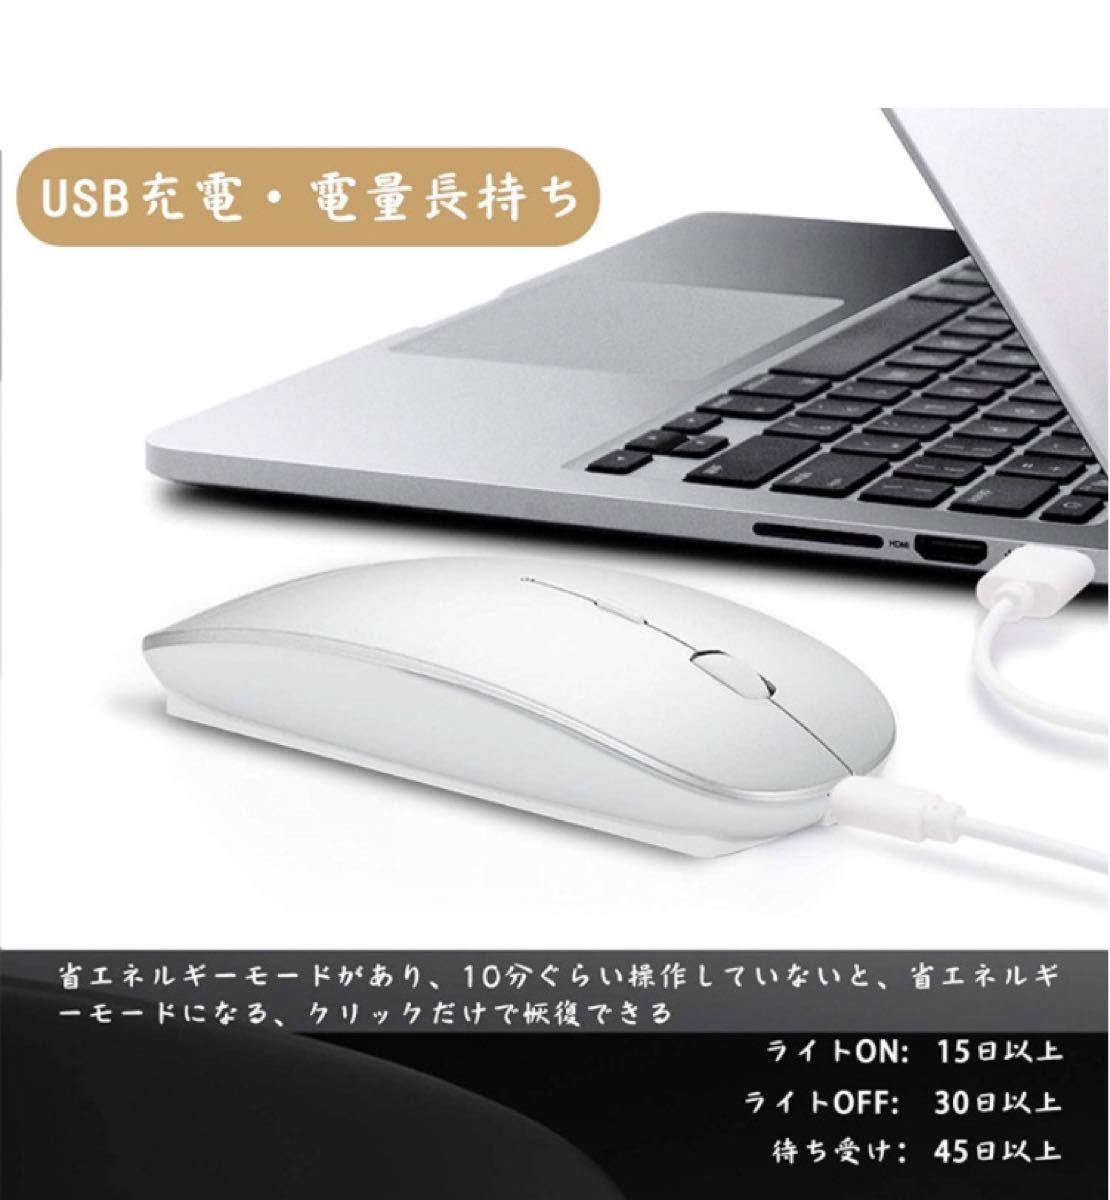 Bluetooth 無線 マウス 超薄型 ワイヤレスマウス 静音 充電式 省エネルギー 3DPIモード 高精度 シルバー